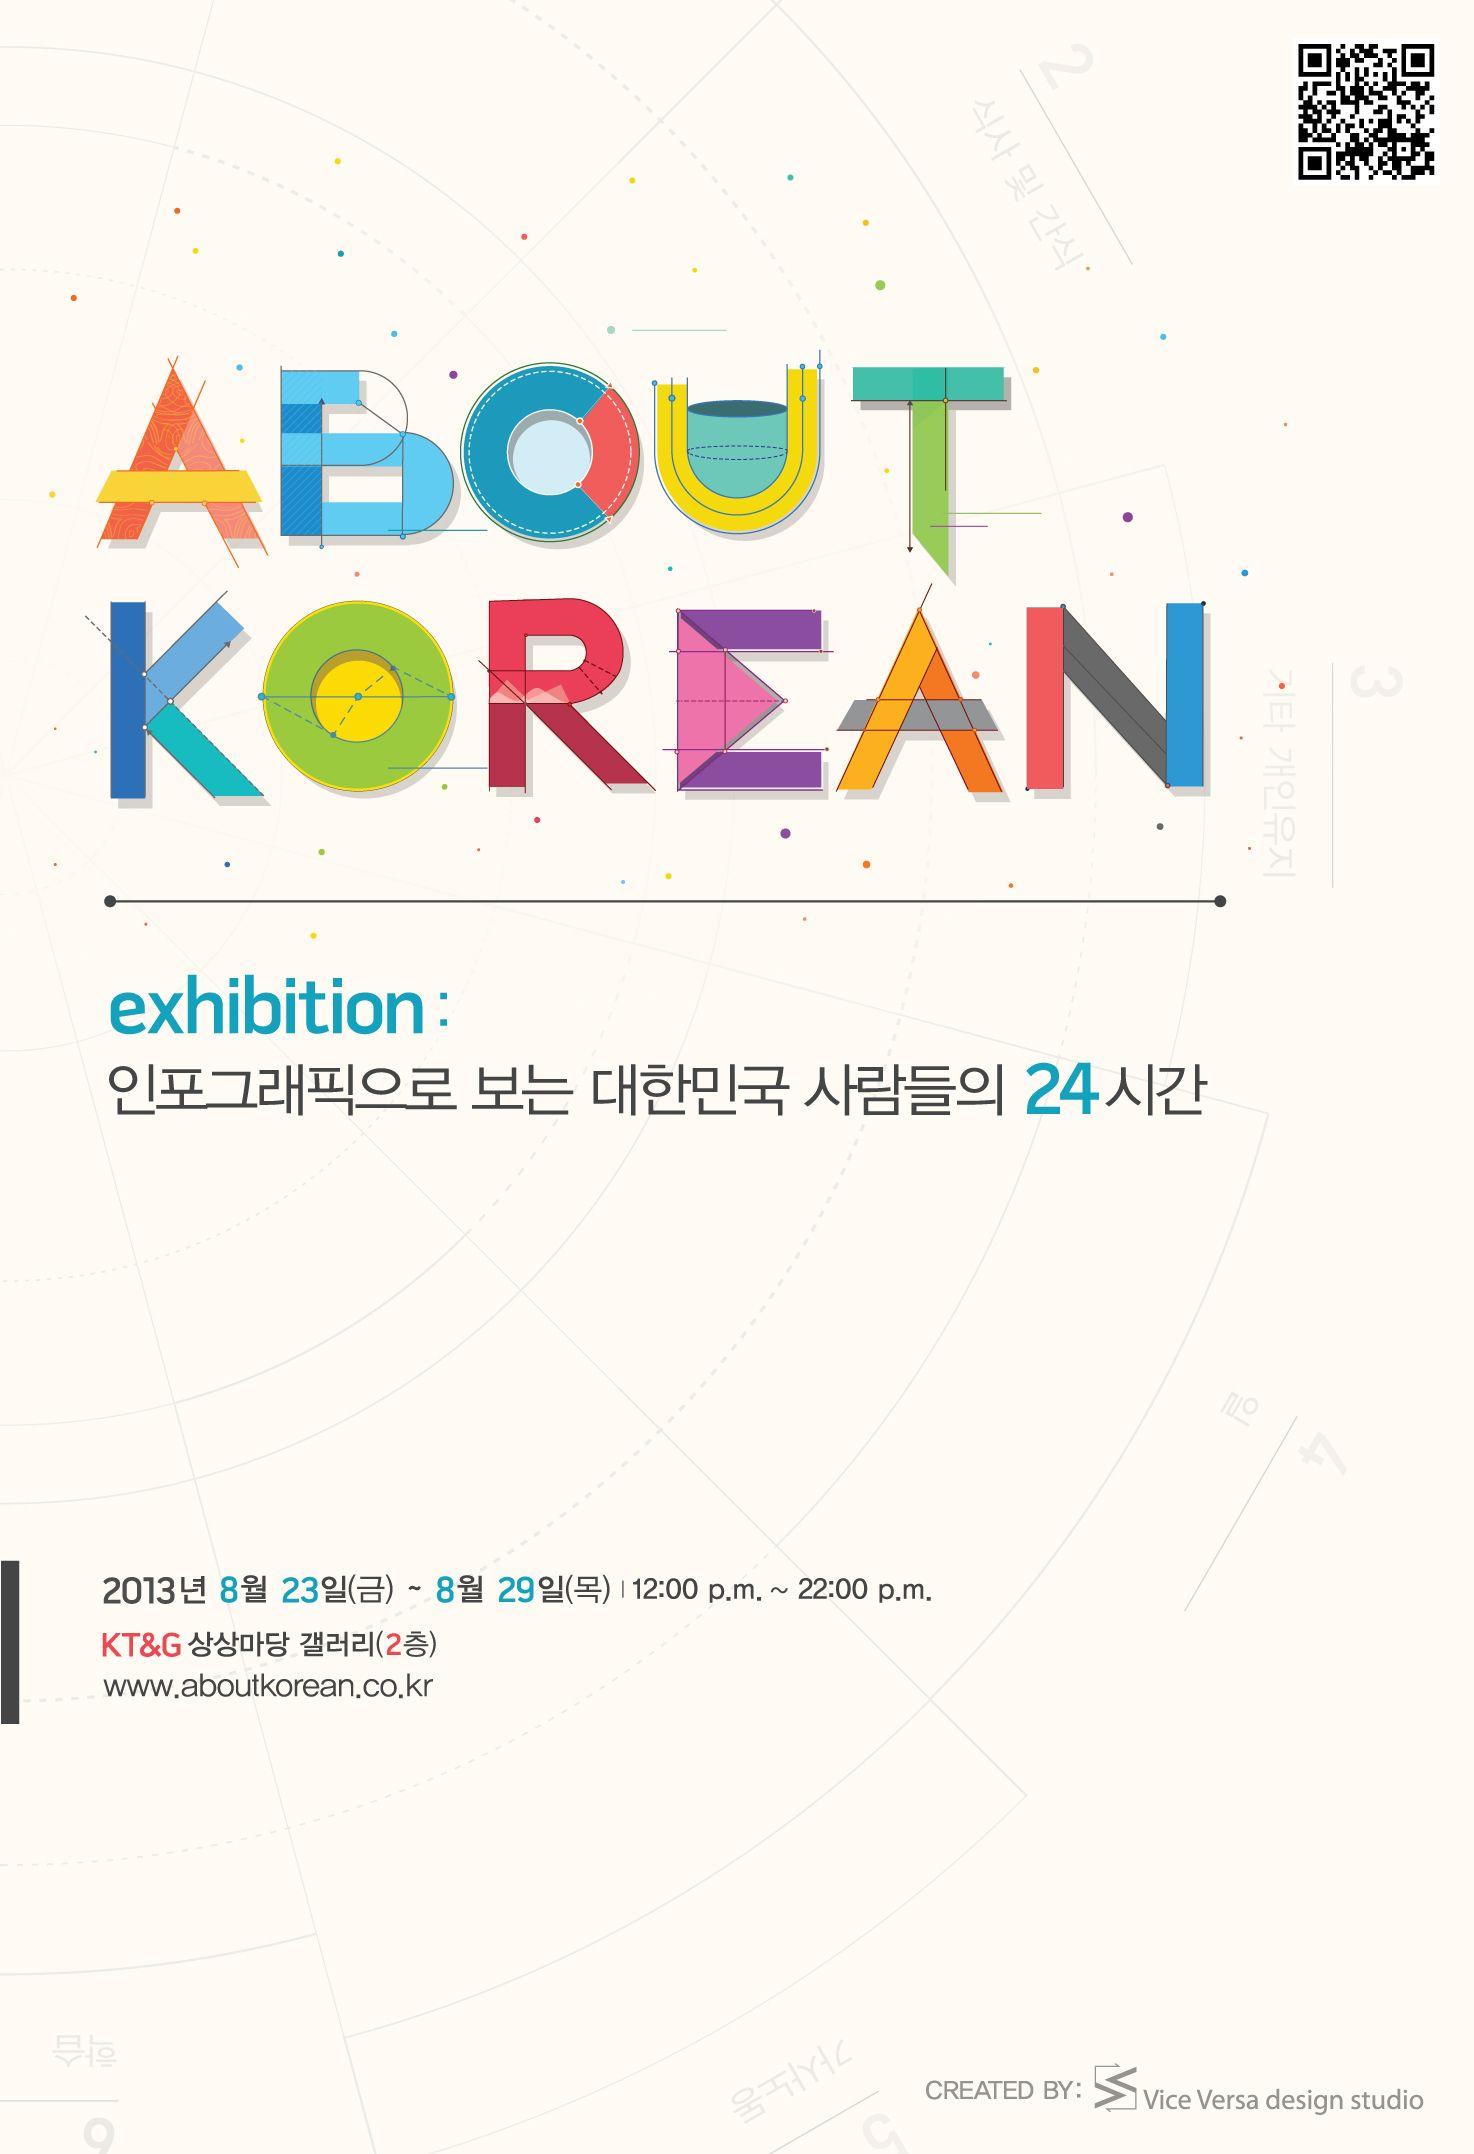 Korean poster design - Kt G Poster Designseditorial Designdesign Studiosexhibitionsinfographickoreapromotiontypography